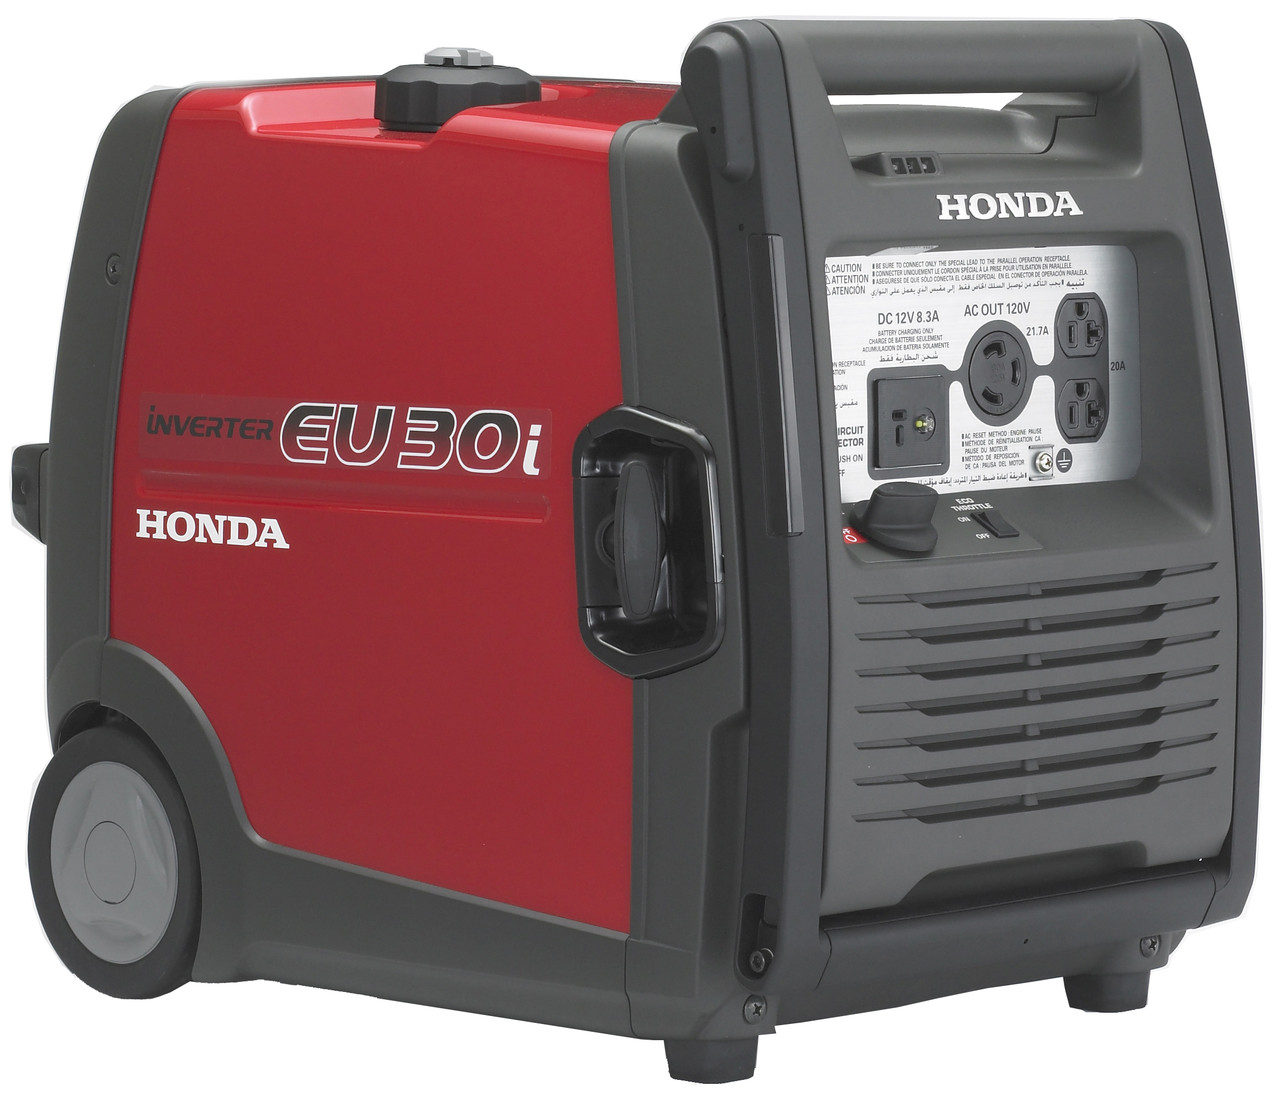 Honda Battery Warranty >> Honda EU30iu Handy Inverter 3kVa Generator | Adelaide Dealer